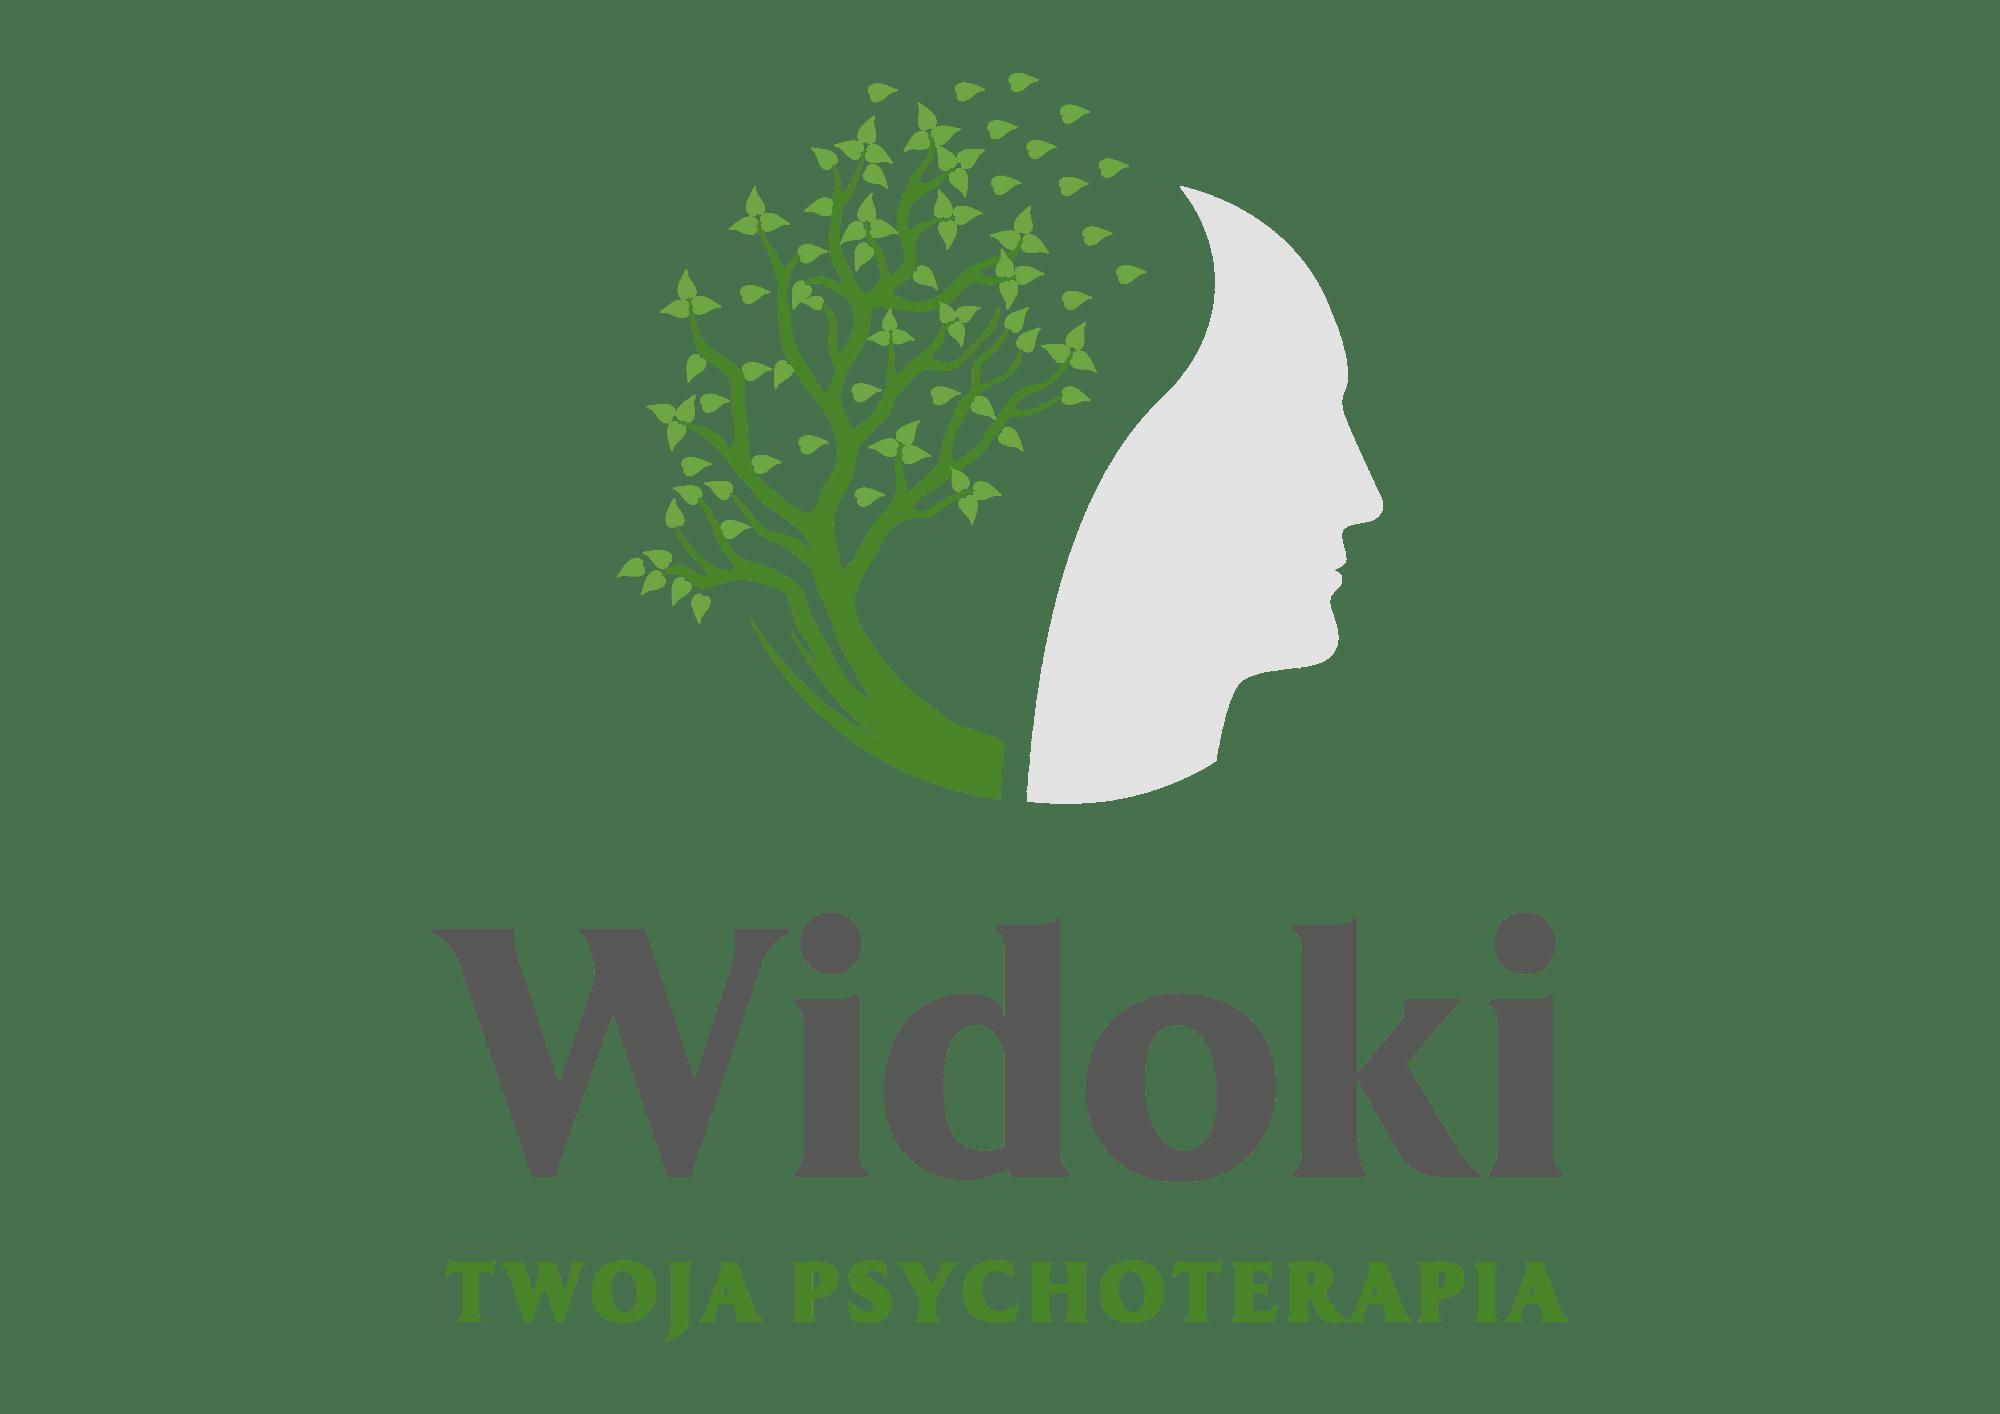 Widoki Psychoterapia